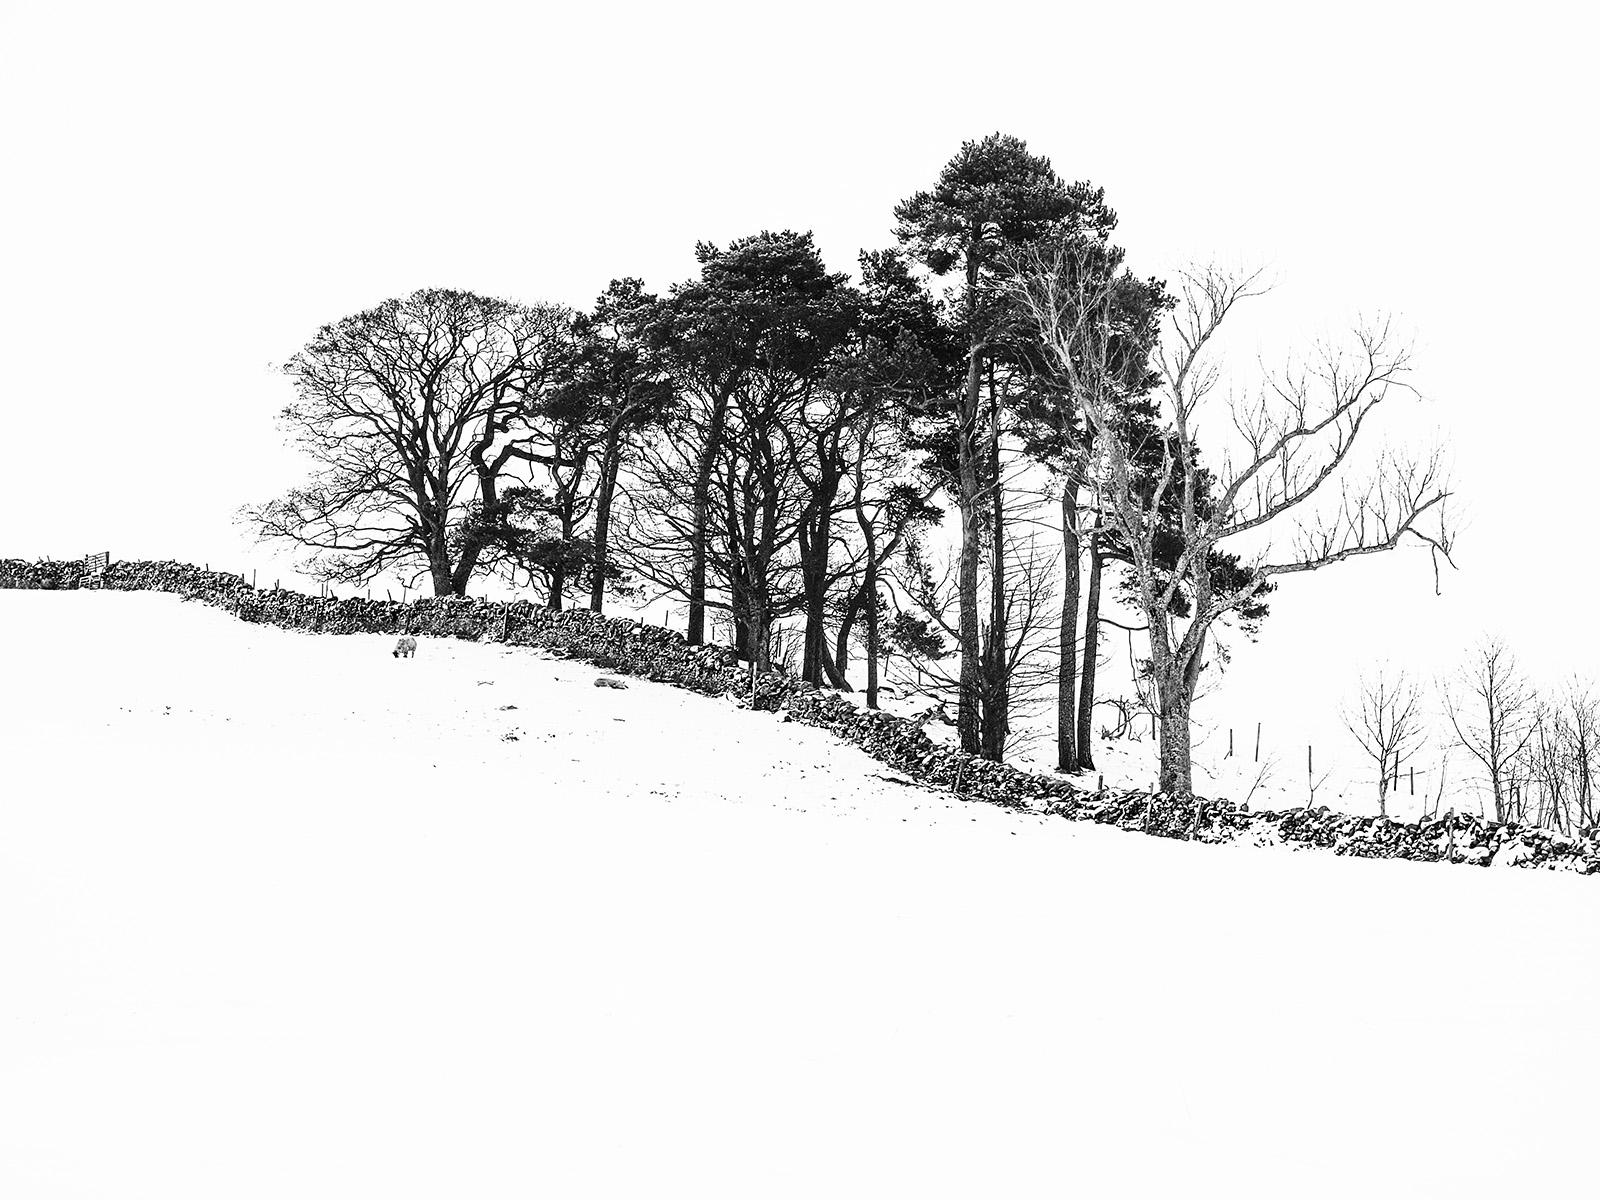 Snowy tree line